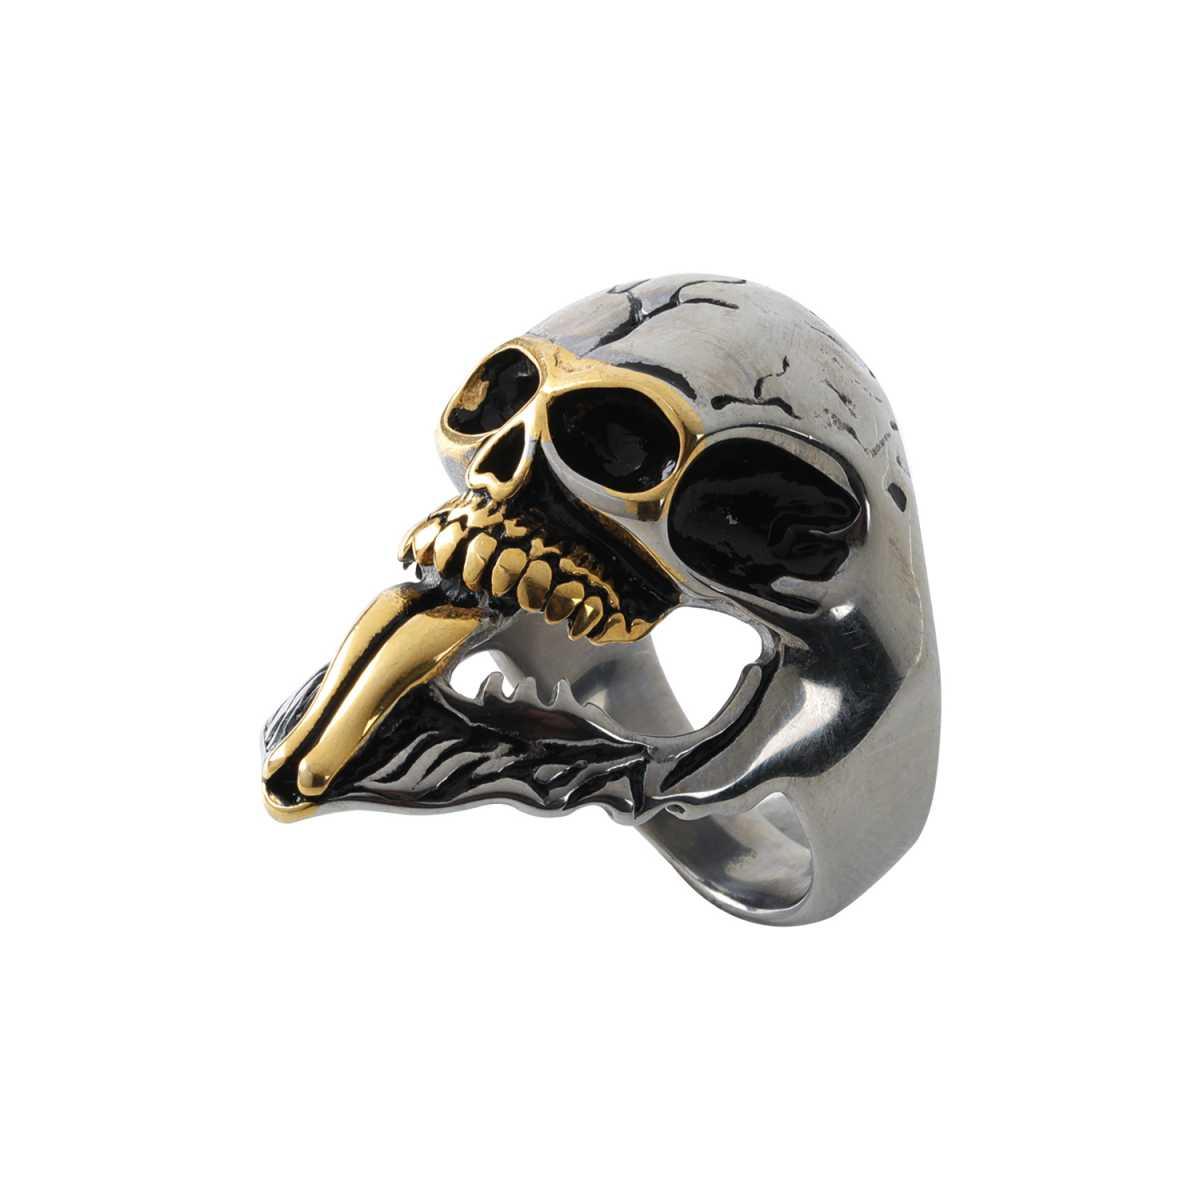 Silver Shine Stainless Steel Gothic Bikers Skull Finger Ring for Boys and Men